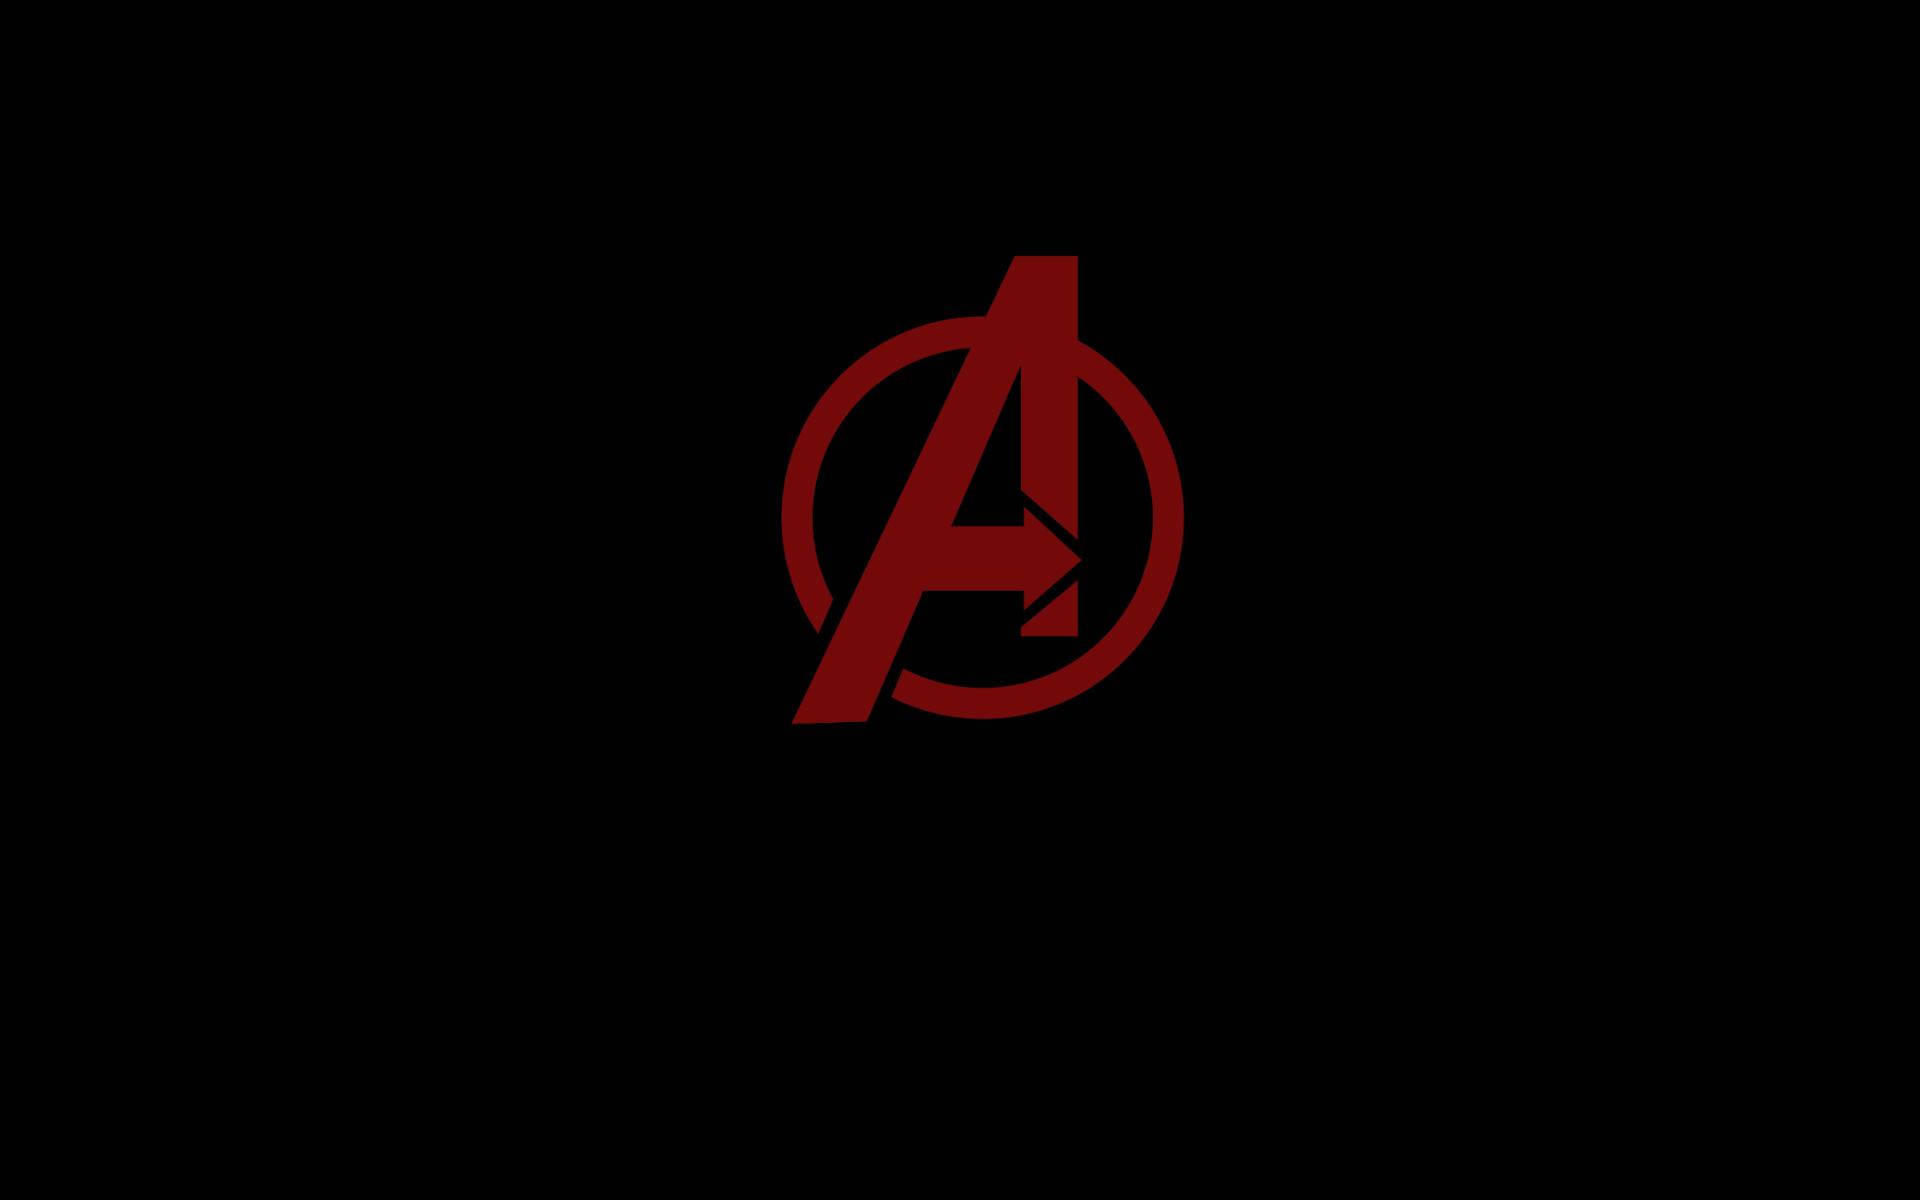 Avengers Minimal Logo Hd Logo 4k Wallpapers Images